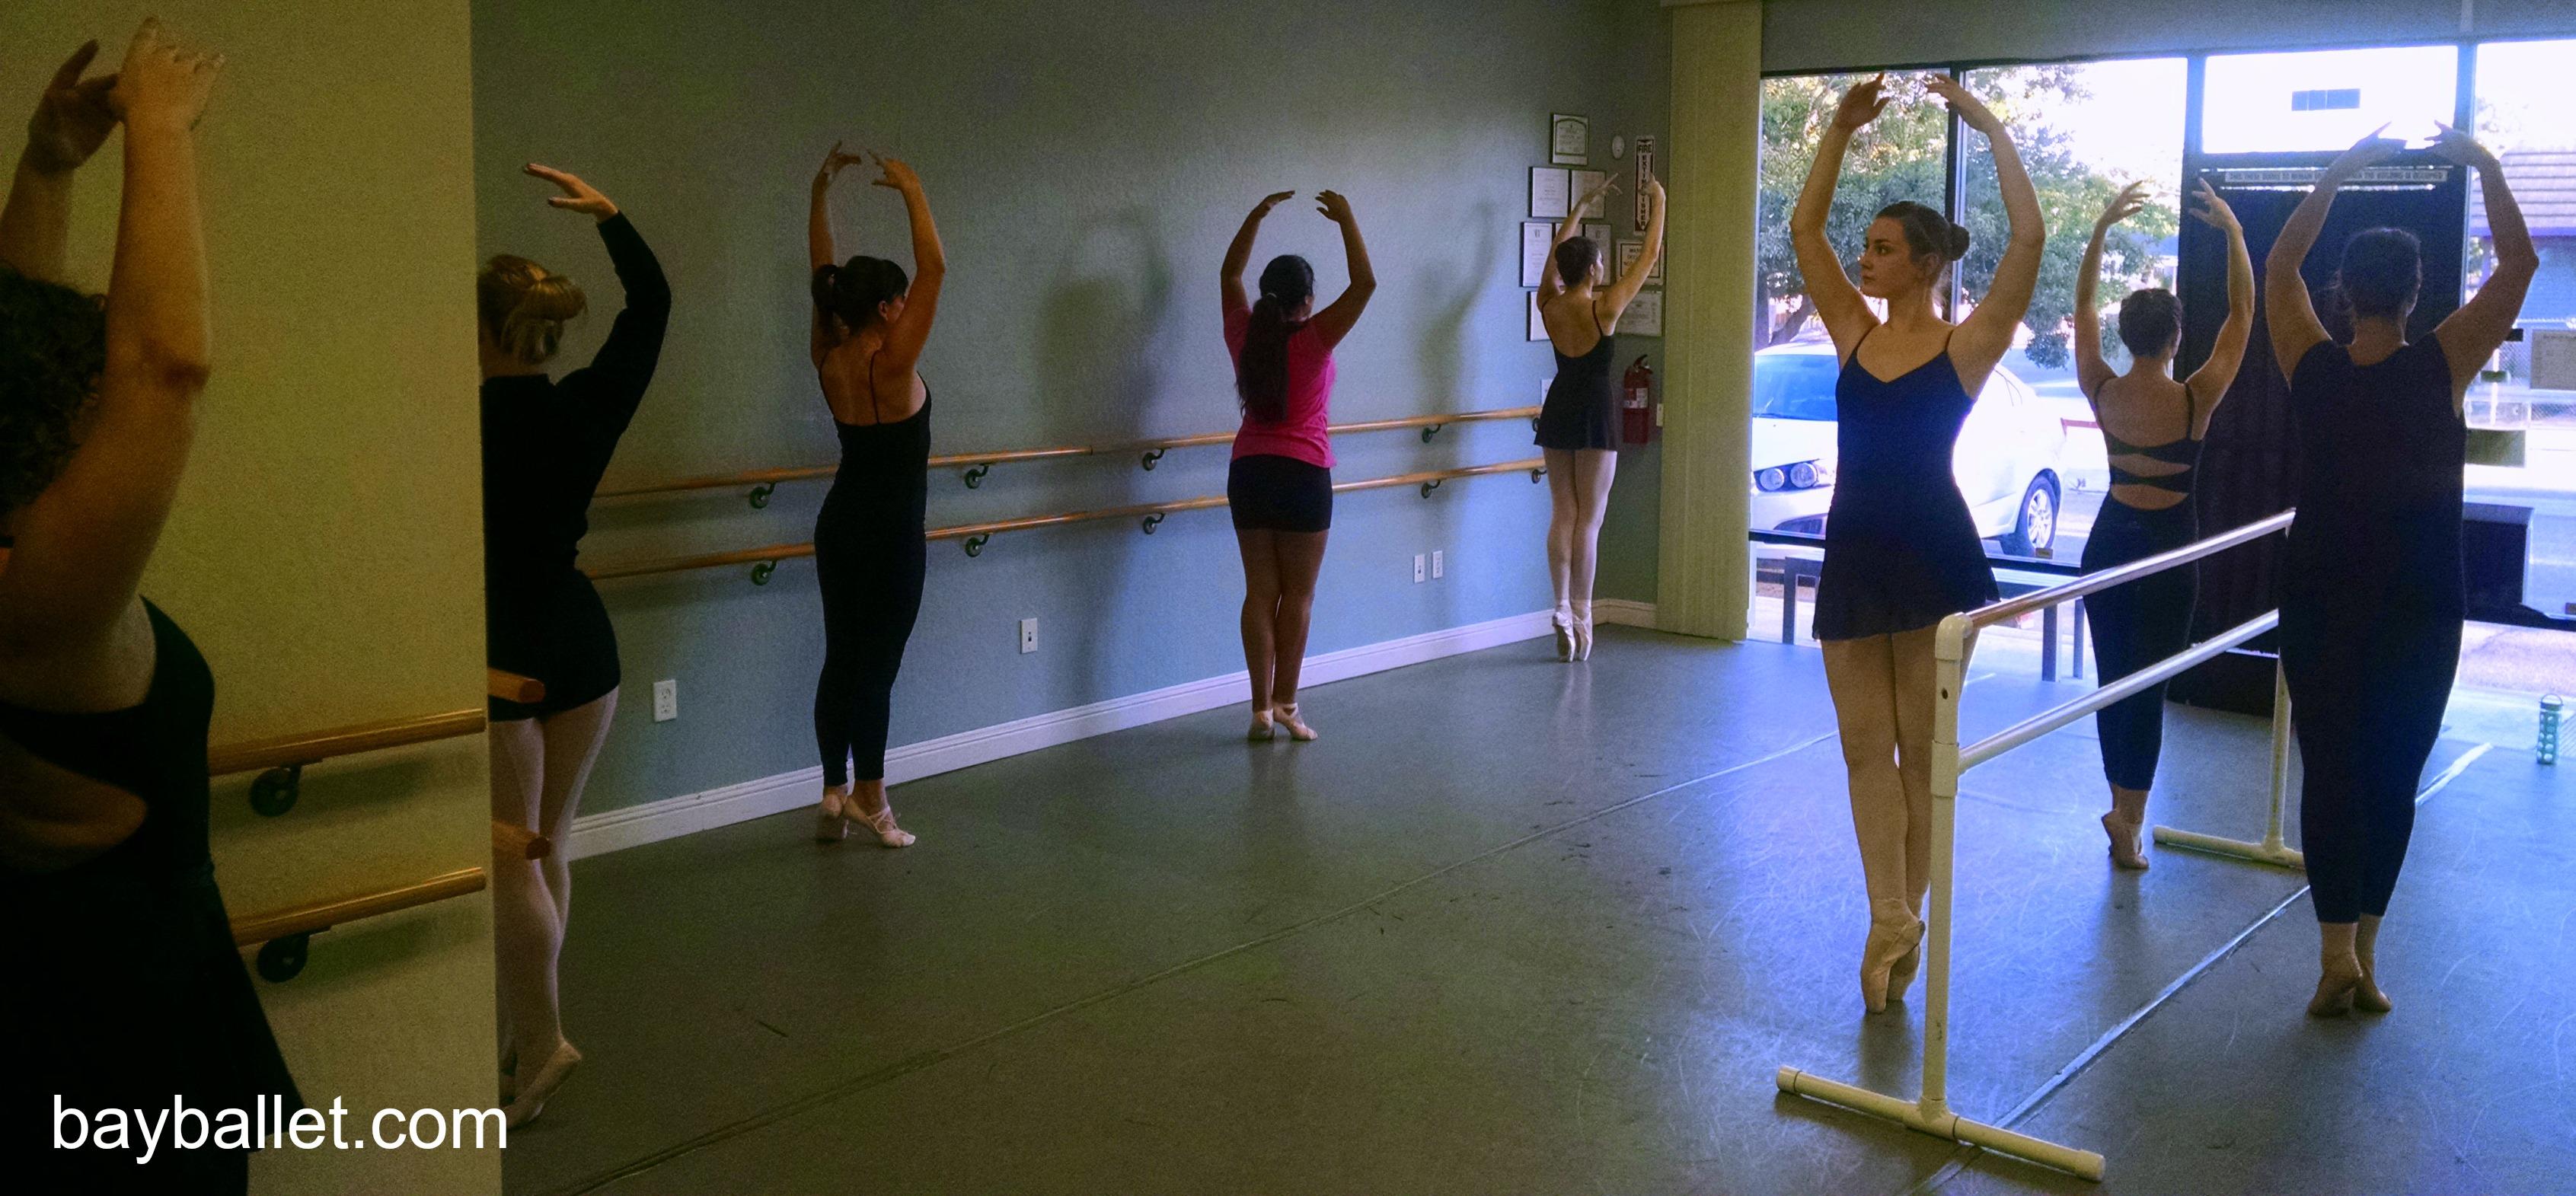 Bay_Ballet_Academy_San_Jose_Willow_Glen_Maximo_Califano_Dance_Classes_Jazz_Lyrical_Hip_Hop_Modern_Neoclassical_Class_3